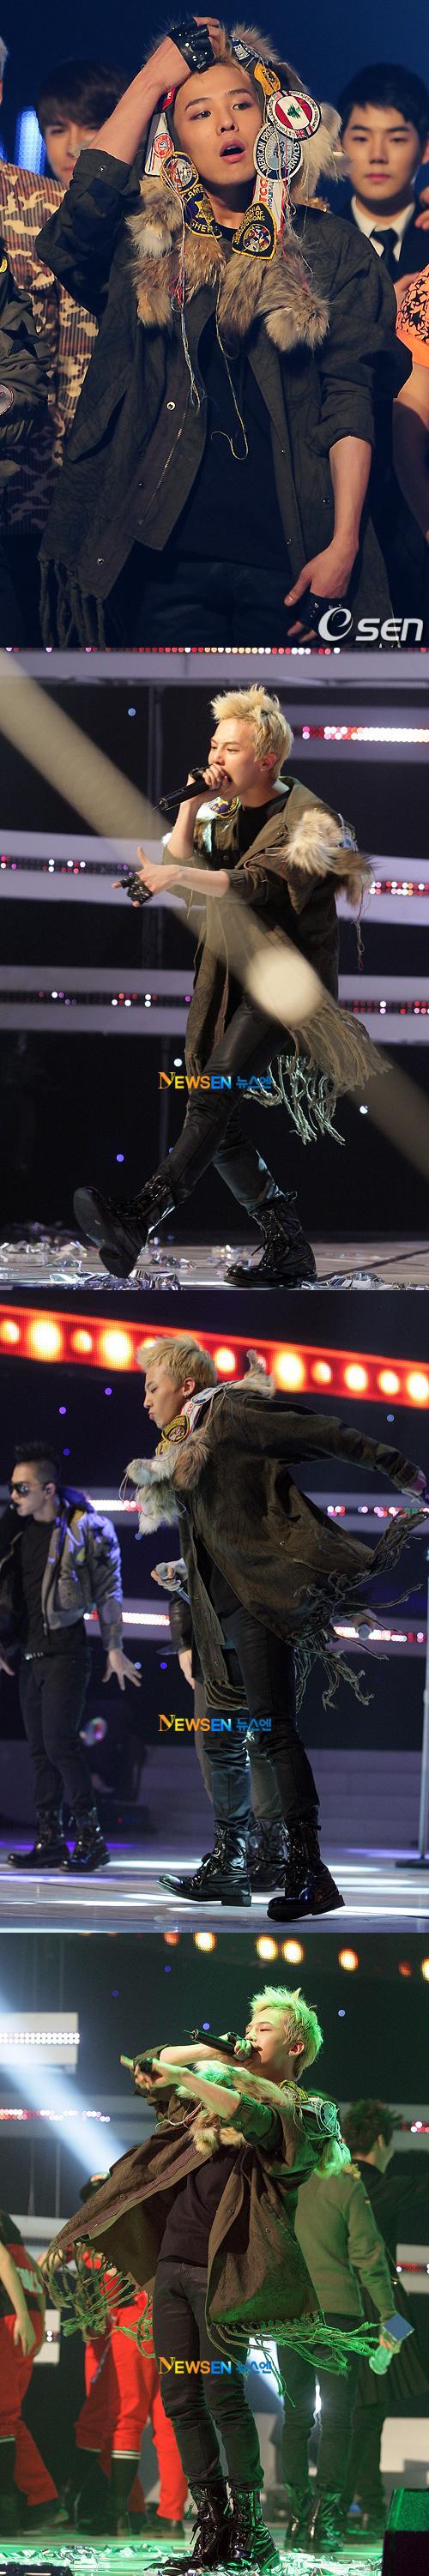 Welcome Blogger Photos Official Photos Big Bang Mnet M Countdown 110310